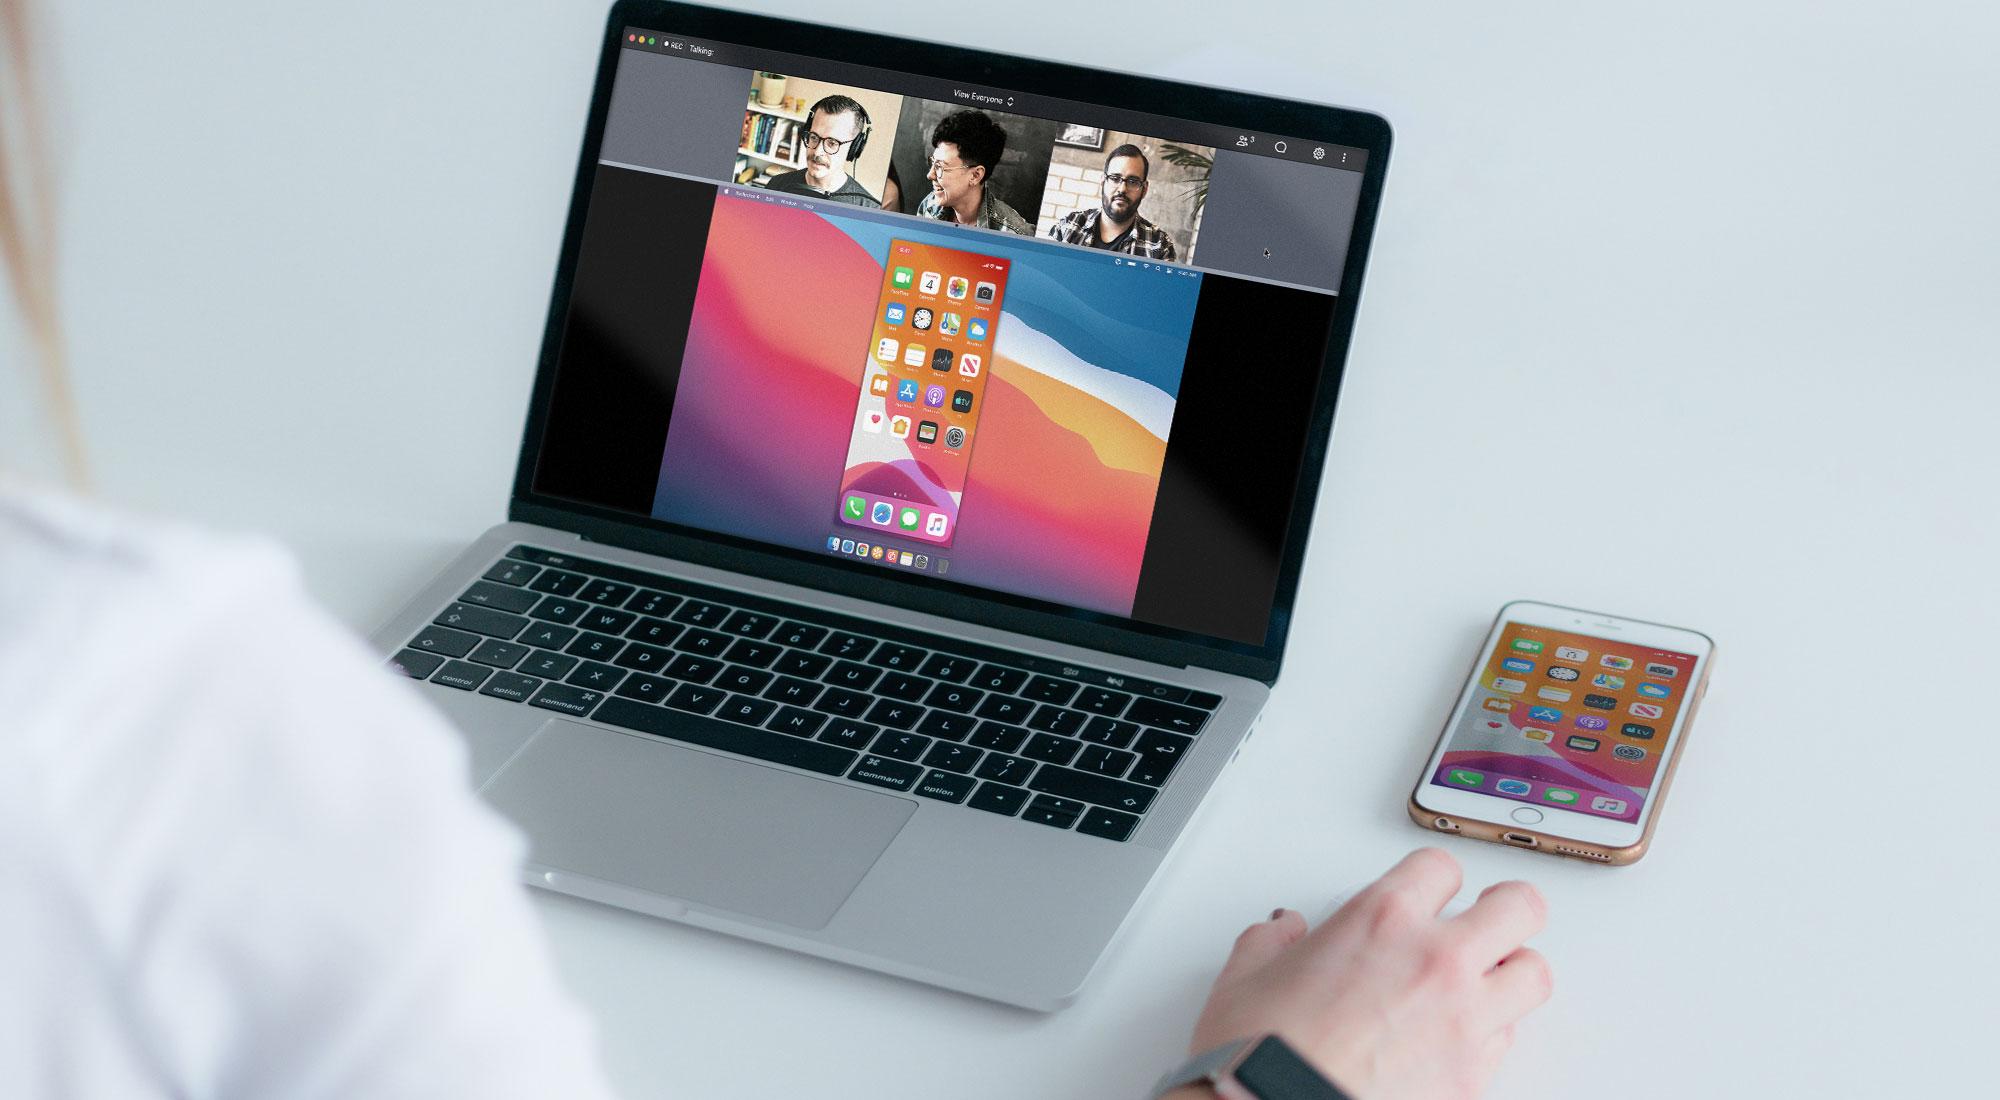 Phone sharing screen to GoToMeeting